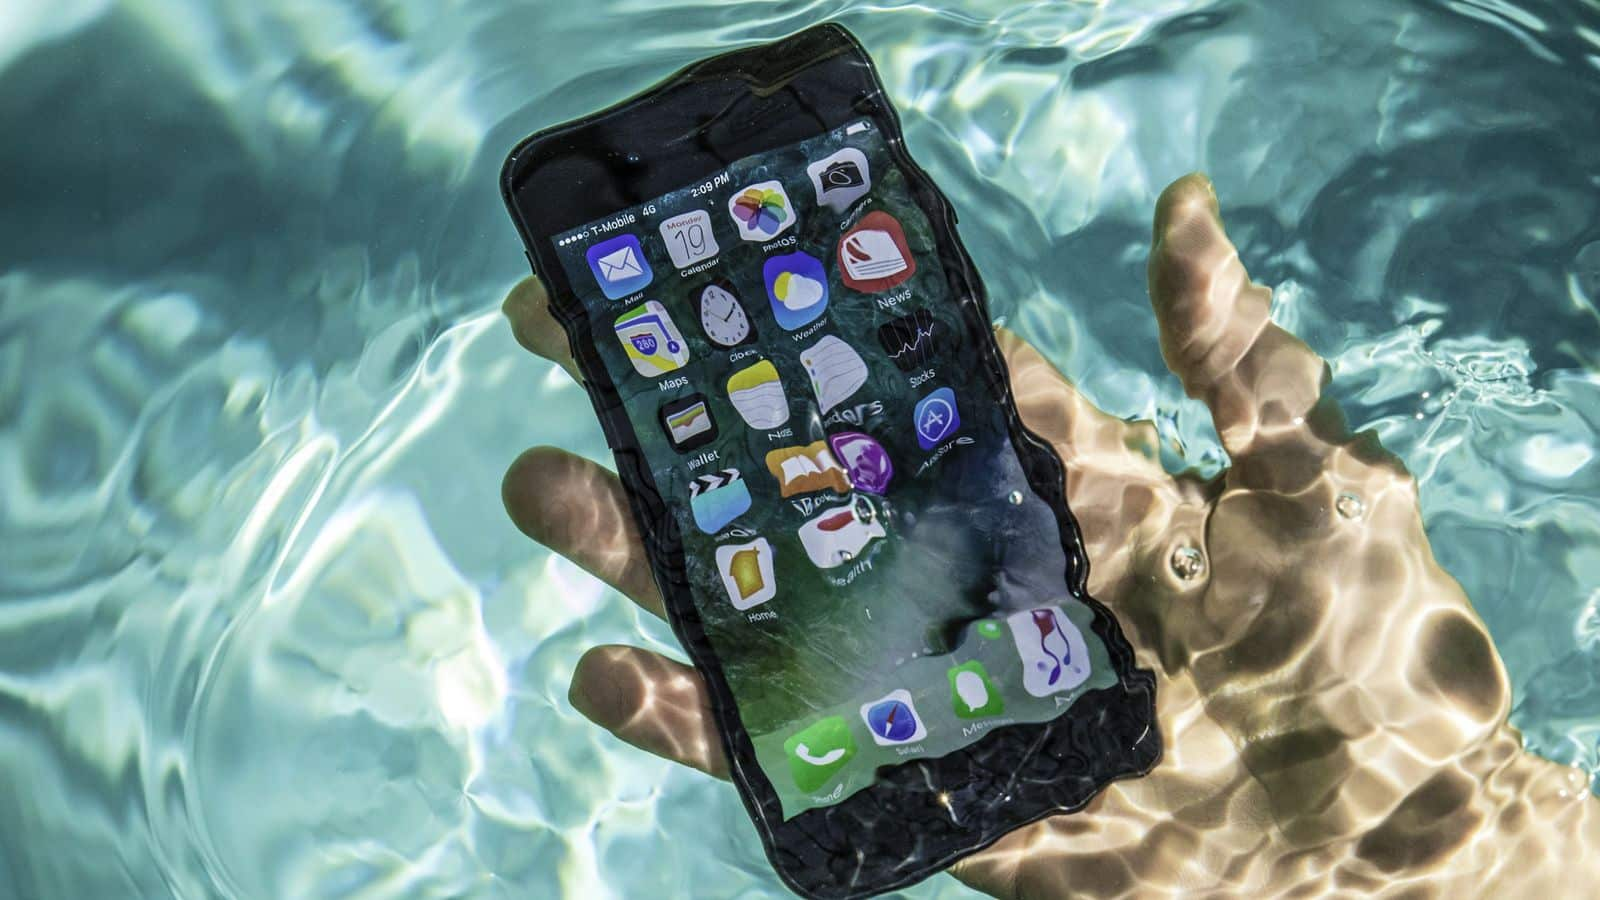 iPhone 7 tombé dans l'eau